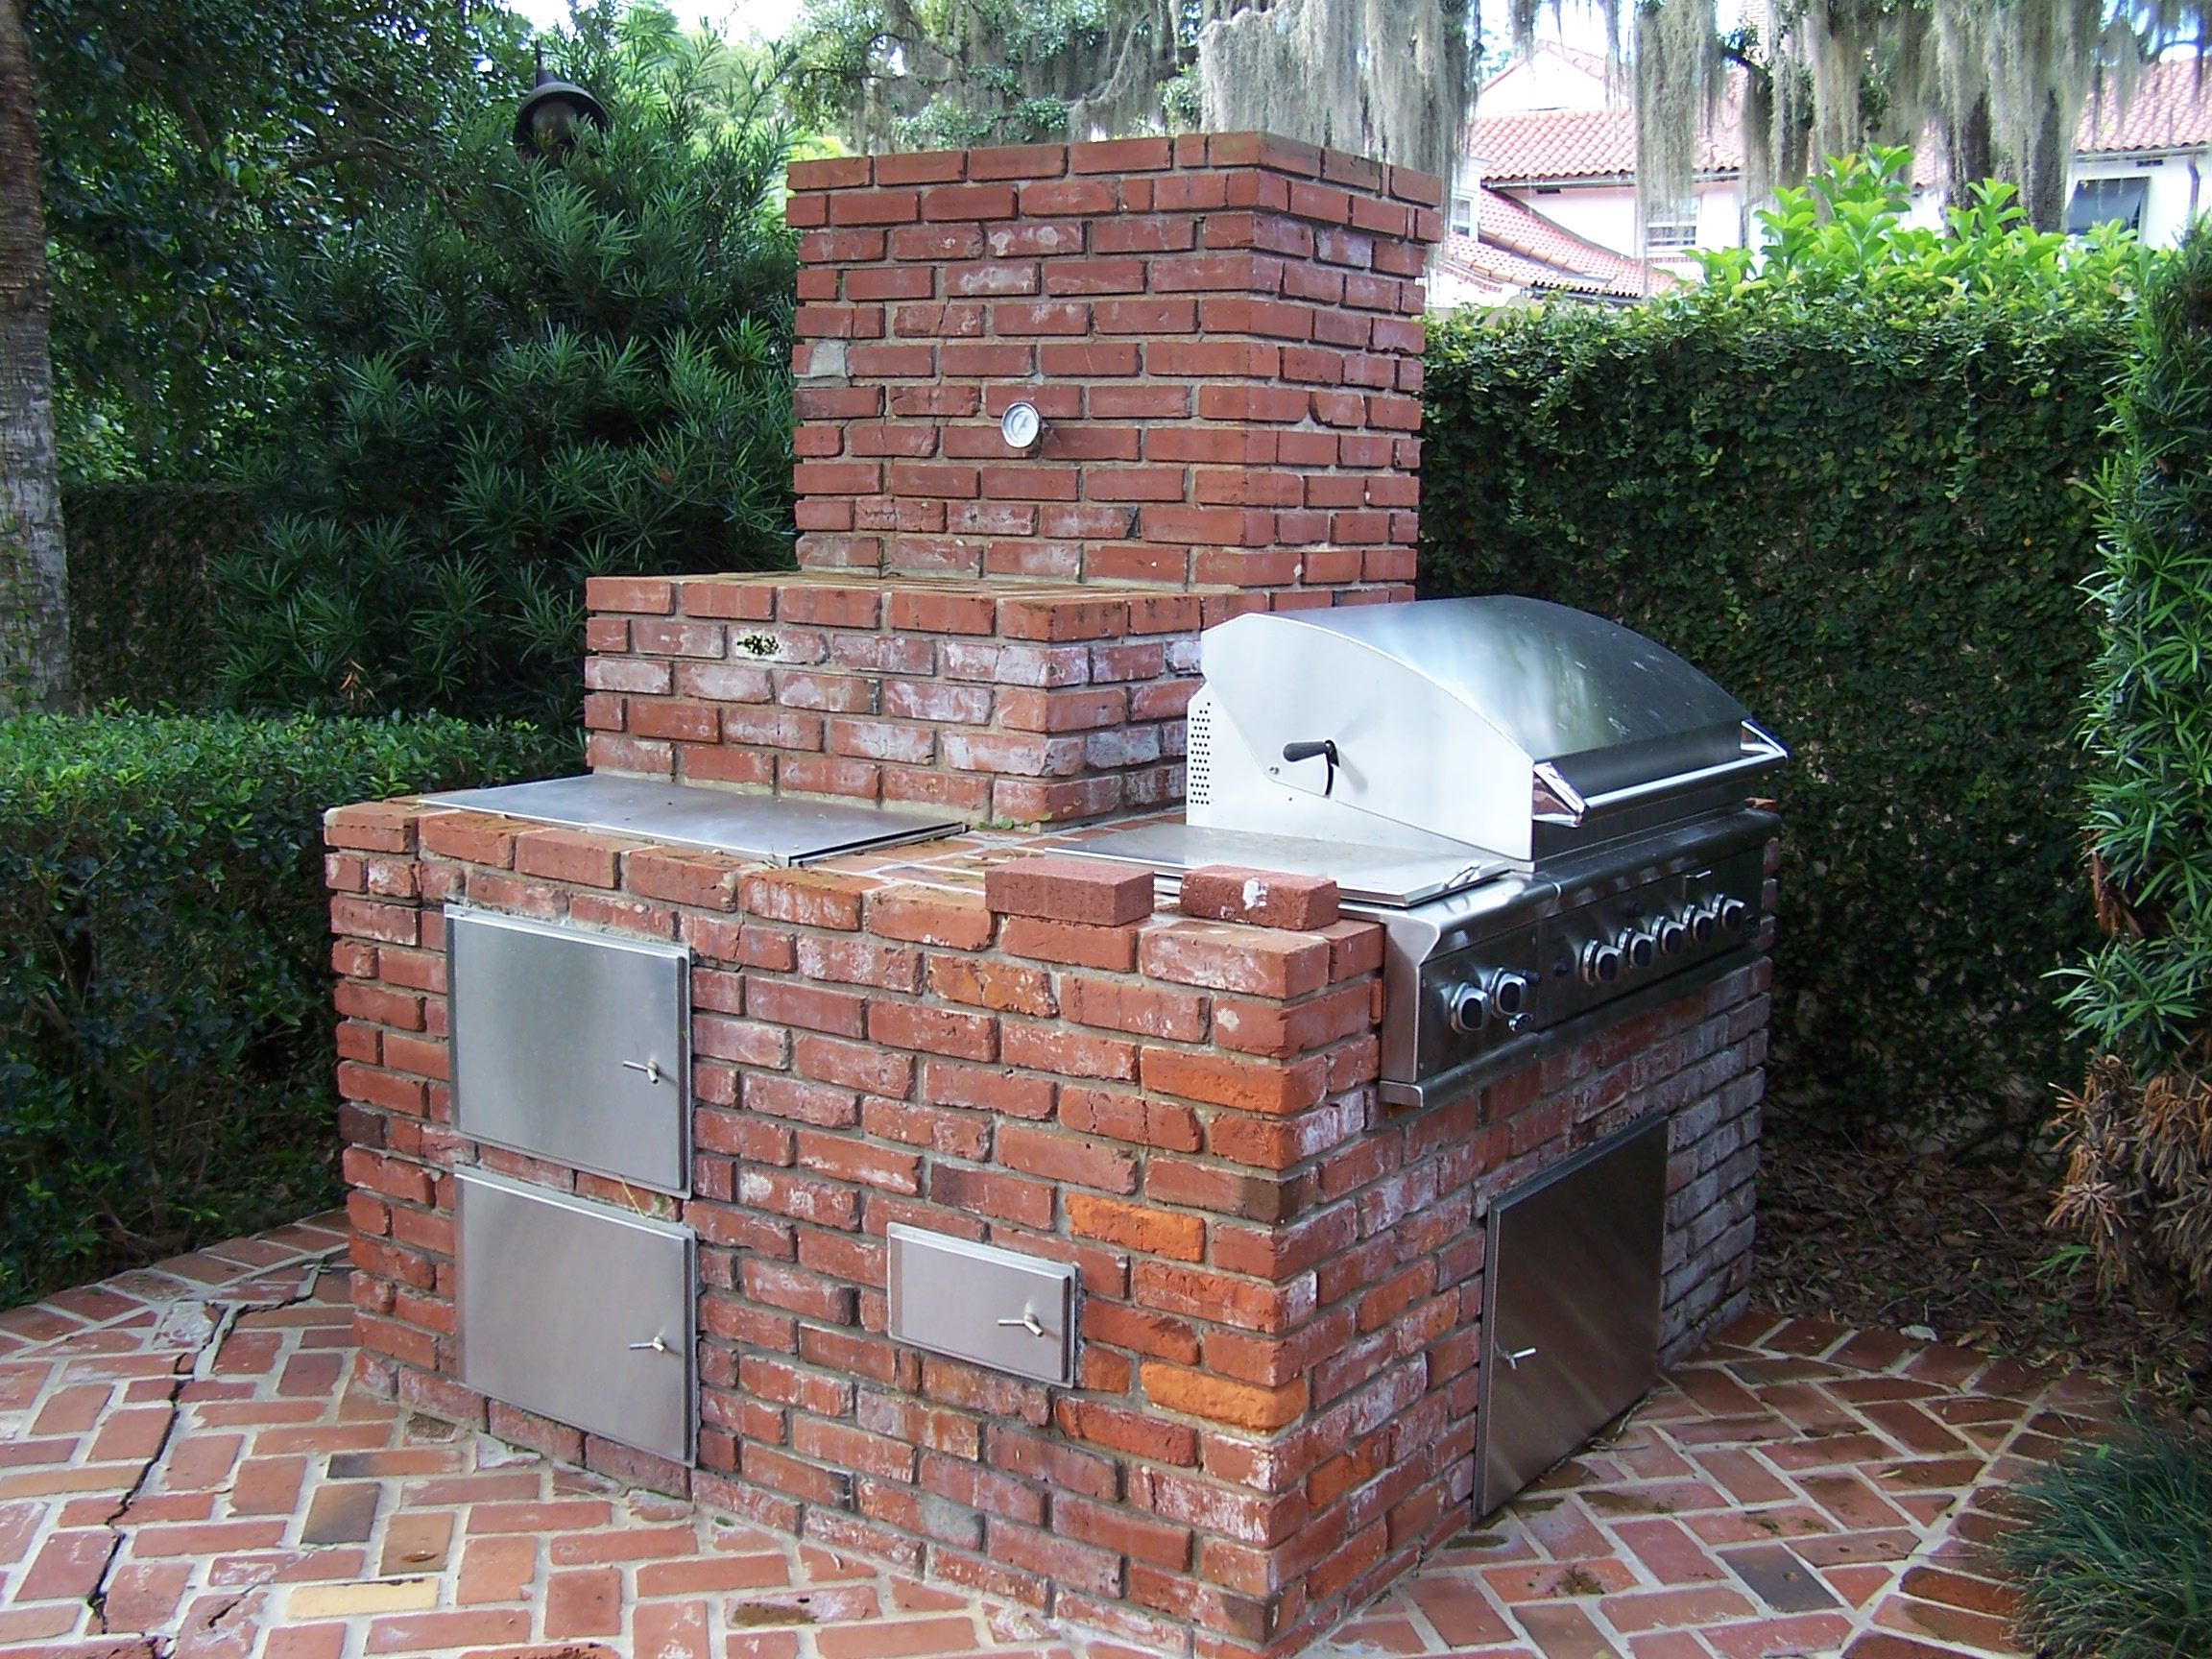 Brick Grill And Smoker